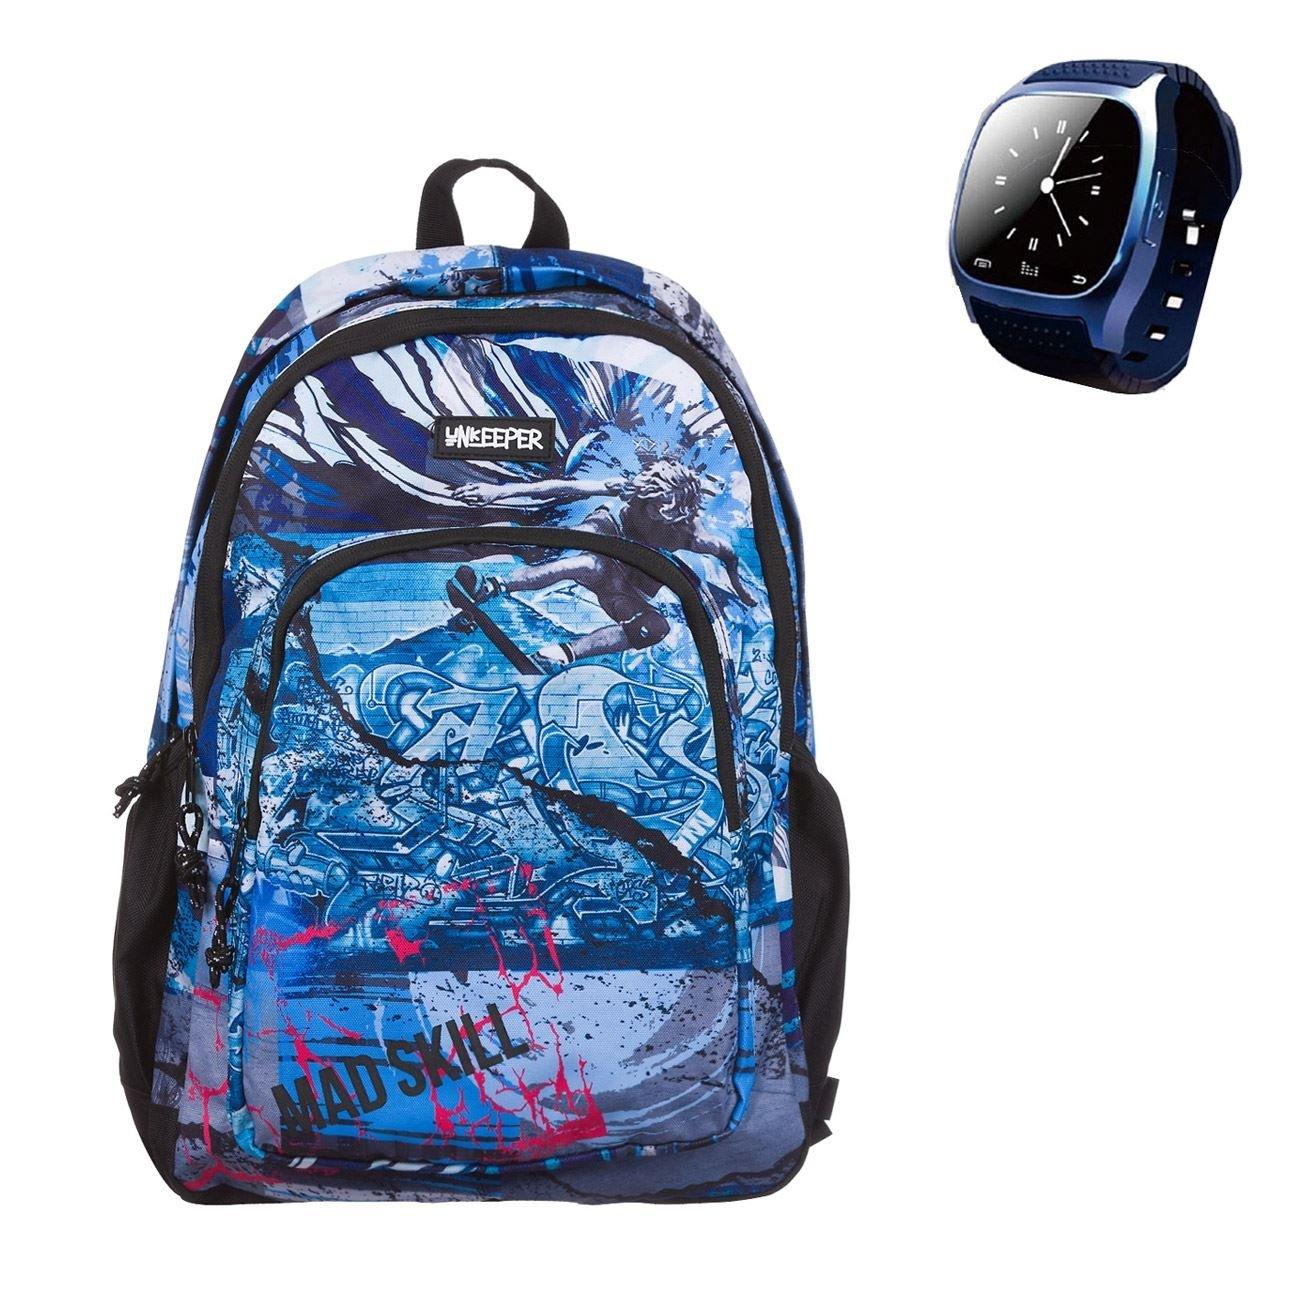 2e83f5dd79 Σχολική Τσάντα Skate   Smartwatch Unkeeper (Διαγωνισμός JUMBO)   Τσάντες  Unkeeper